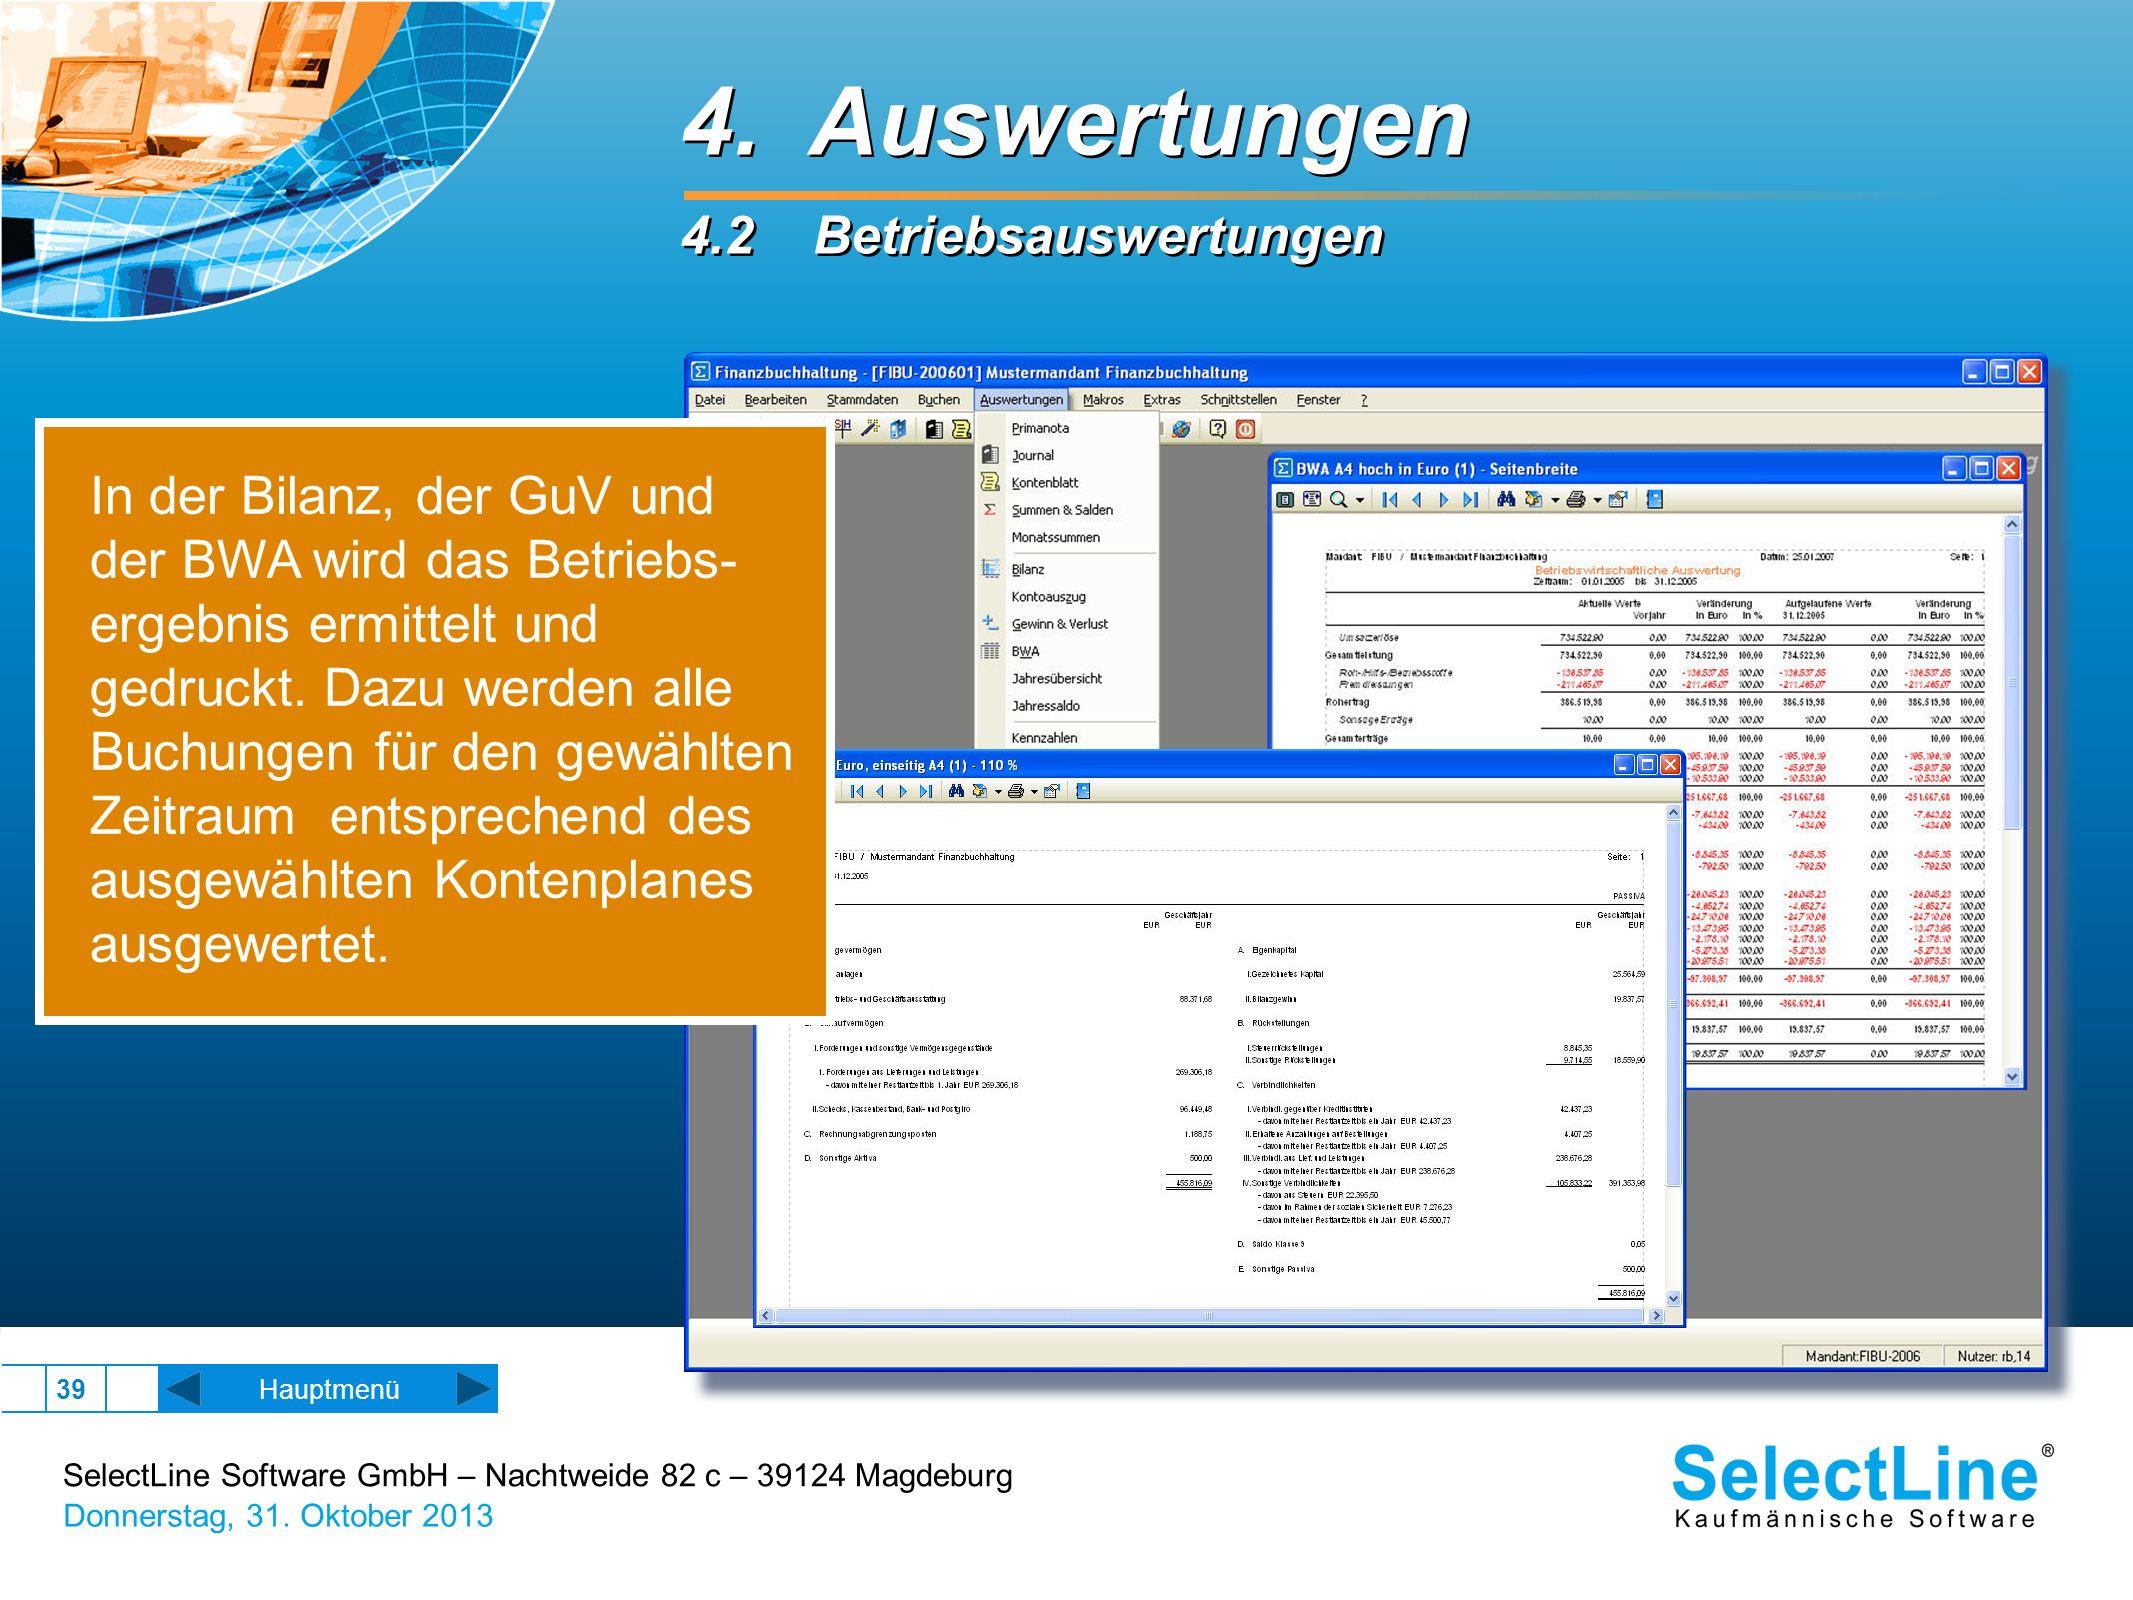 SelectLine Software GmbH – Nachtweide 82 c – 39124 Magdeburg Donnerstag, 31. Oktober 2013 39 Hauptmenü 4. Auswertungen 4.2 Betriebsauswertungen 4. Aus